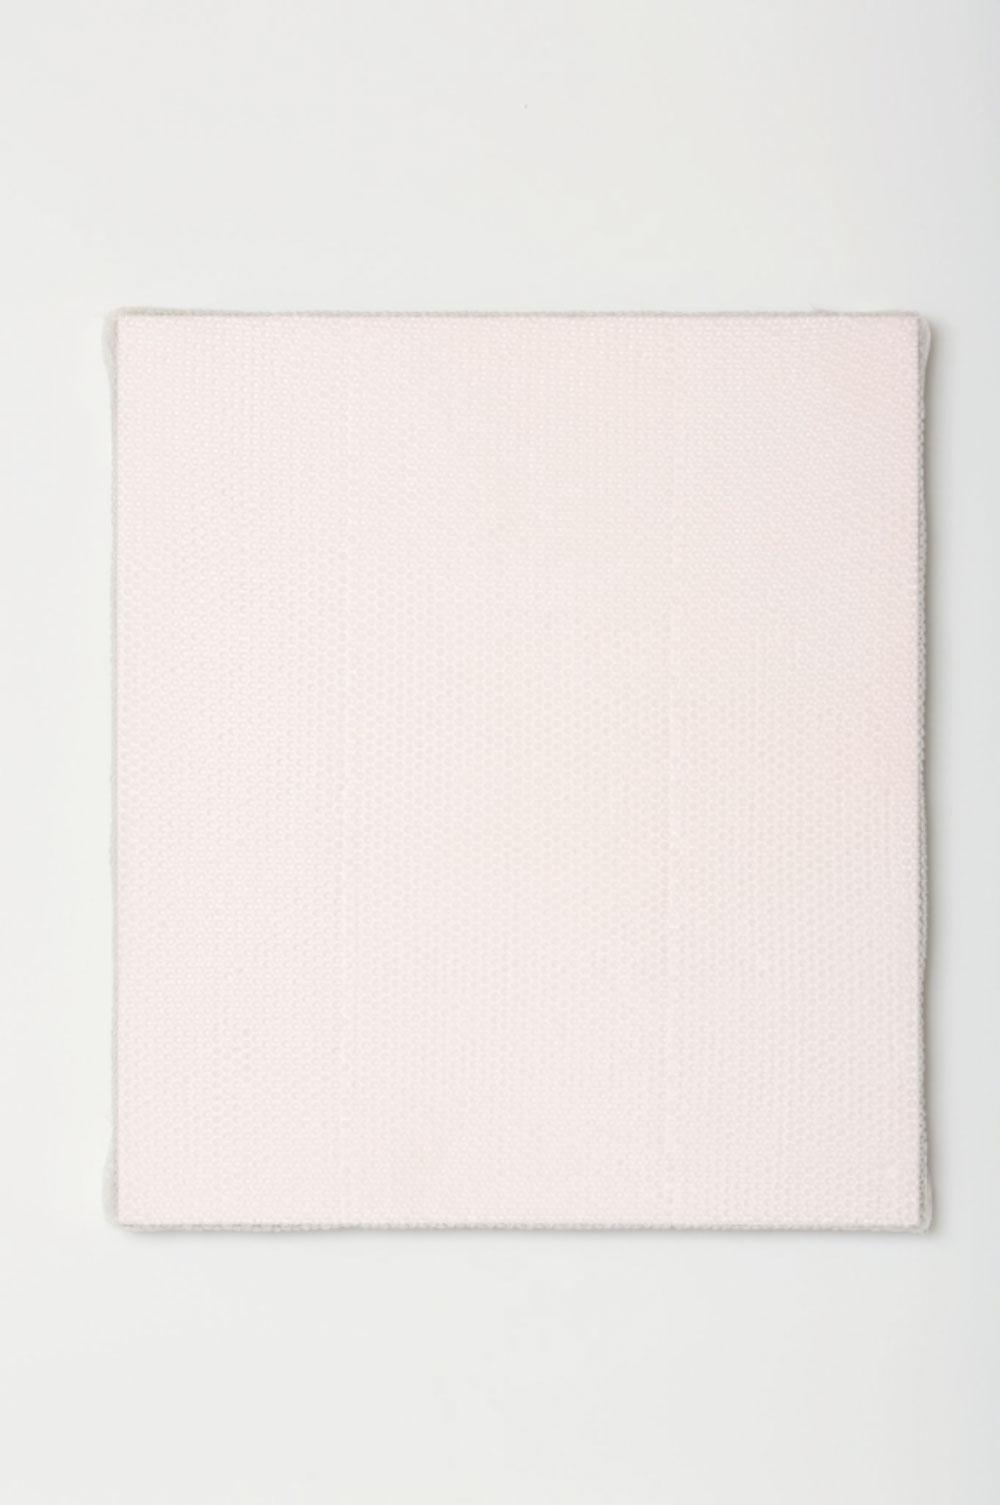 "Pink Monochrome with Bubble Wrap and Packing Tape , 2017 Acrylique sur toile de lin  34 x 30 x 1 1/2""."